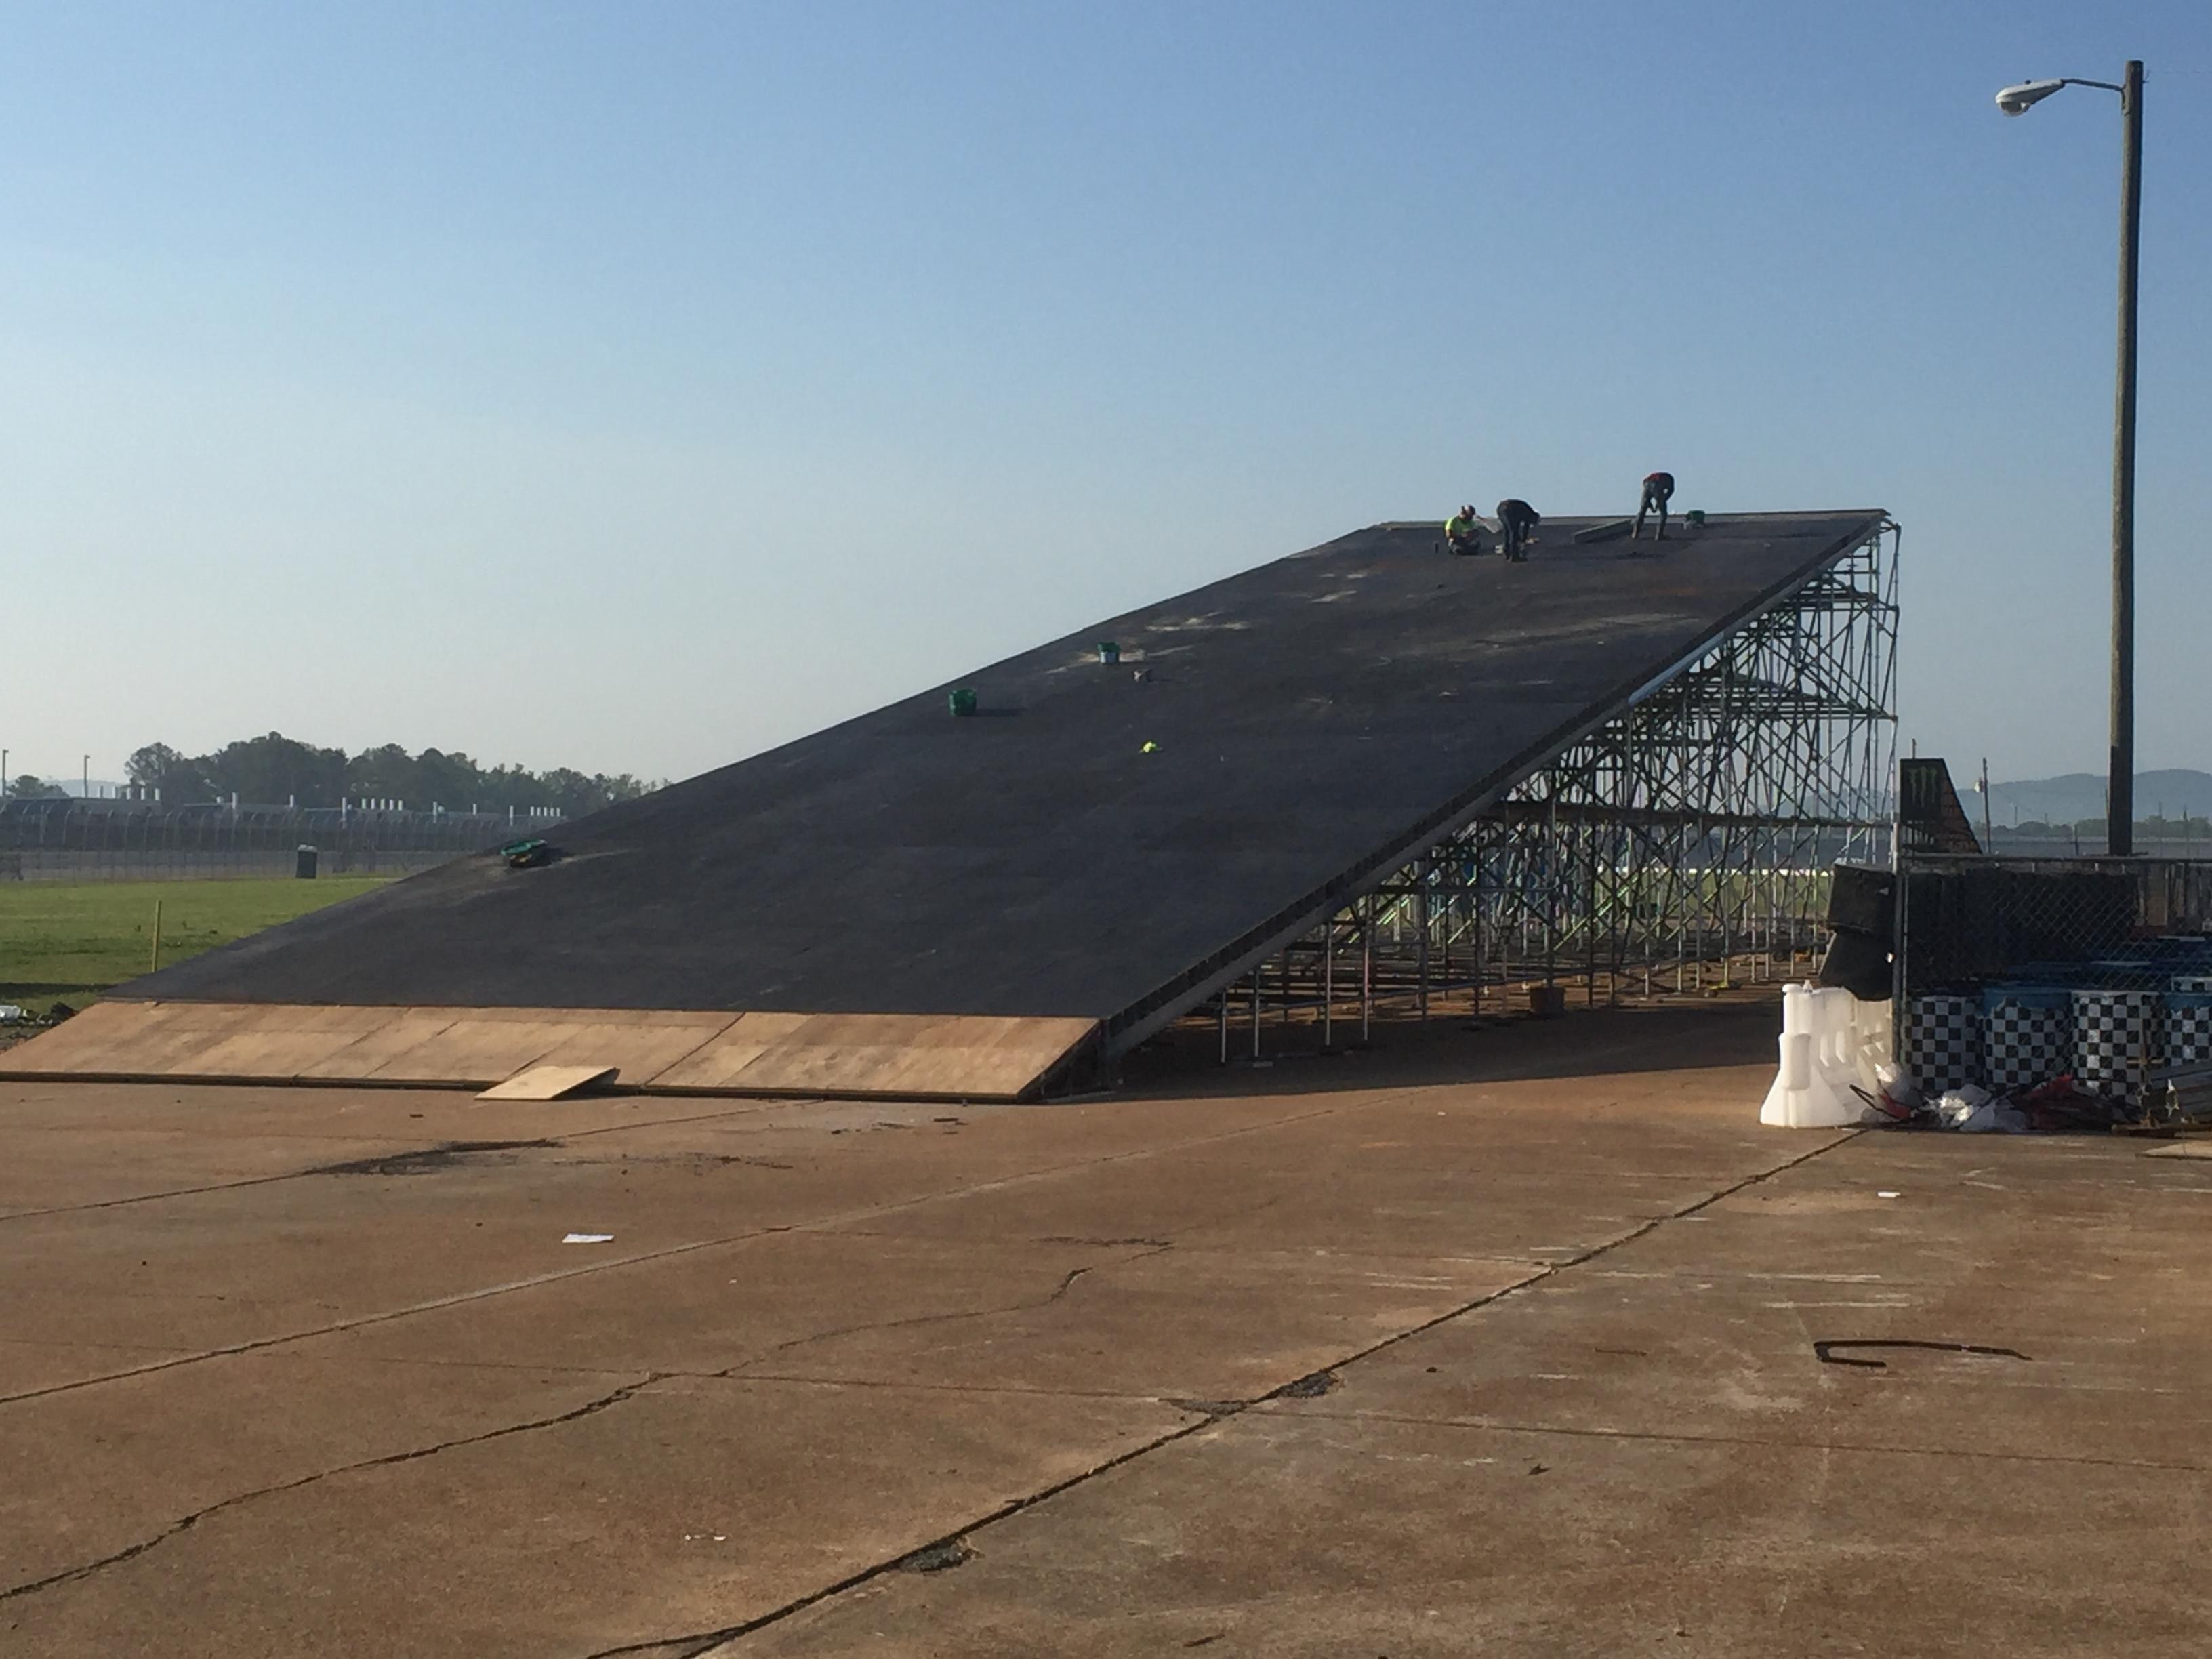 Talledega Superspeedway scaffold motorcycle ramp 2